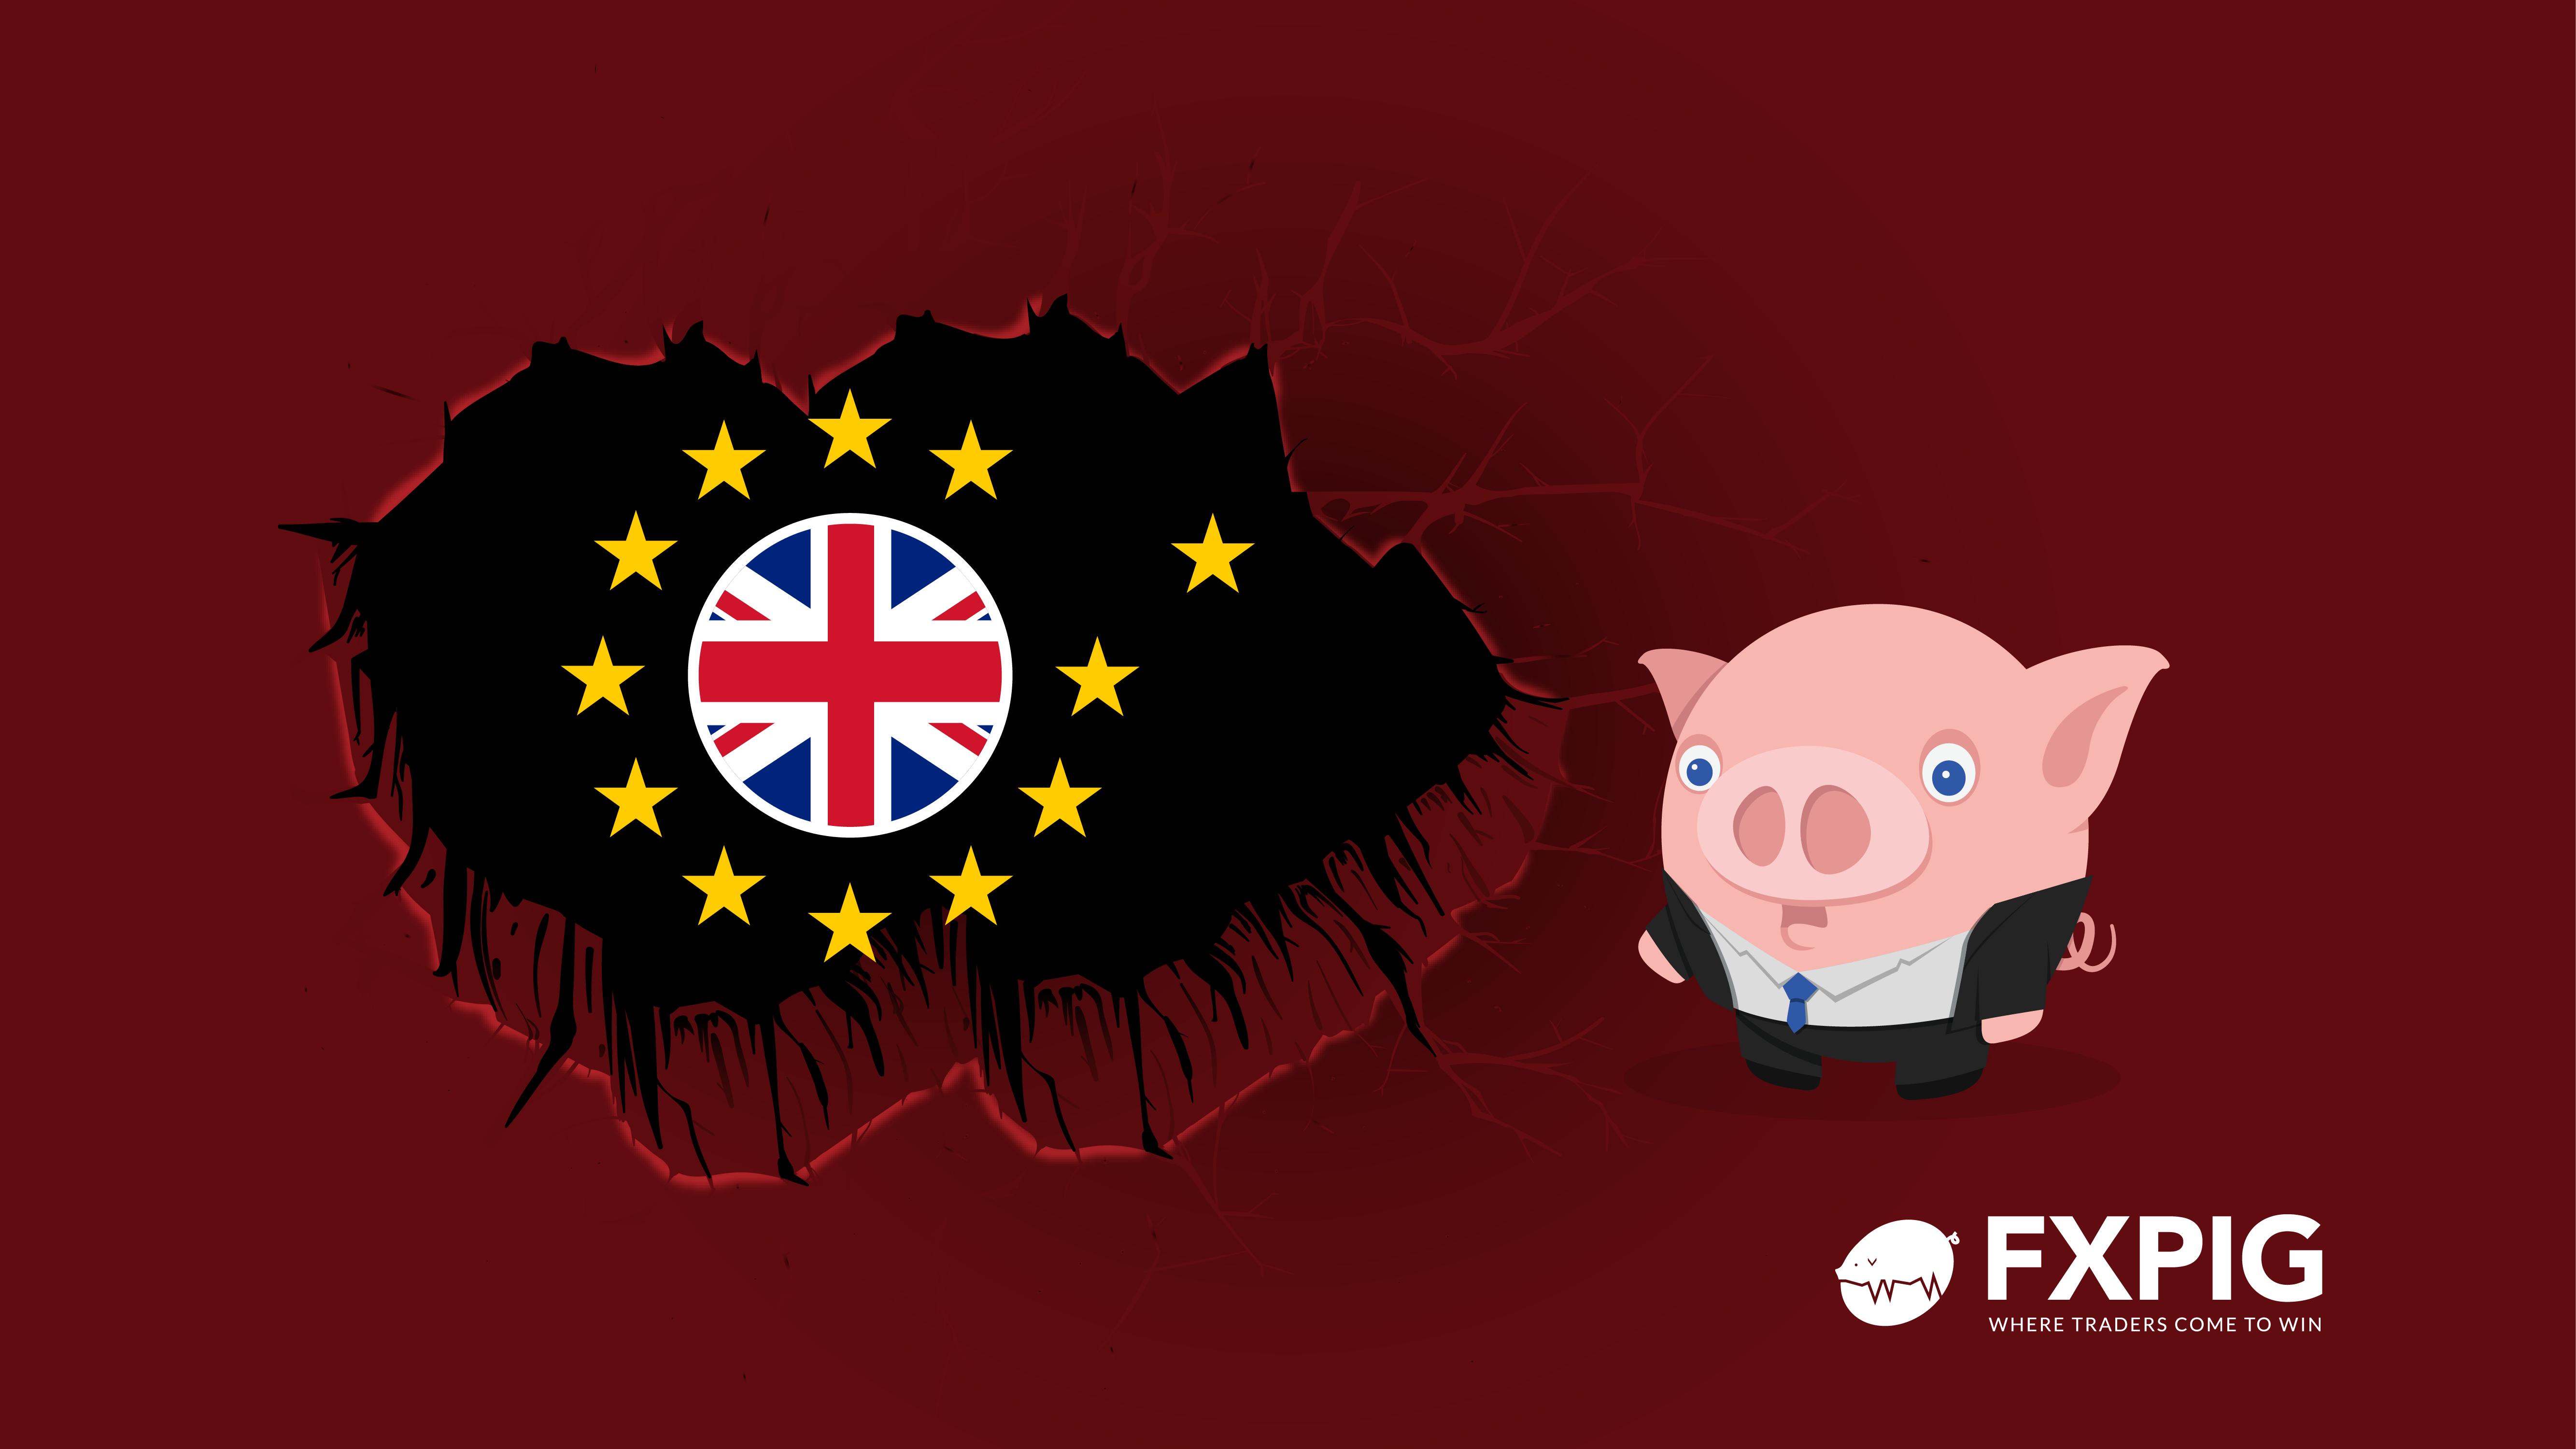 FOREX_Brexit-Negotiations-continuing-2310_FXPIG